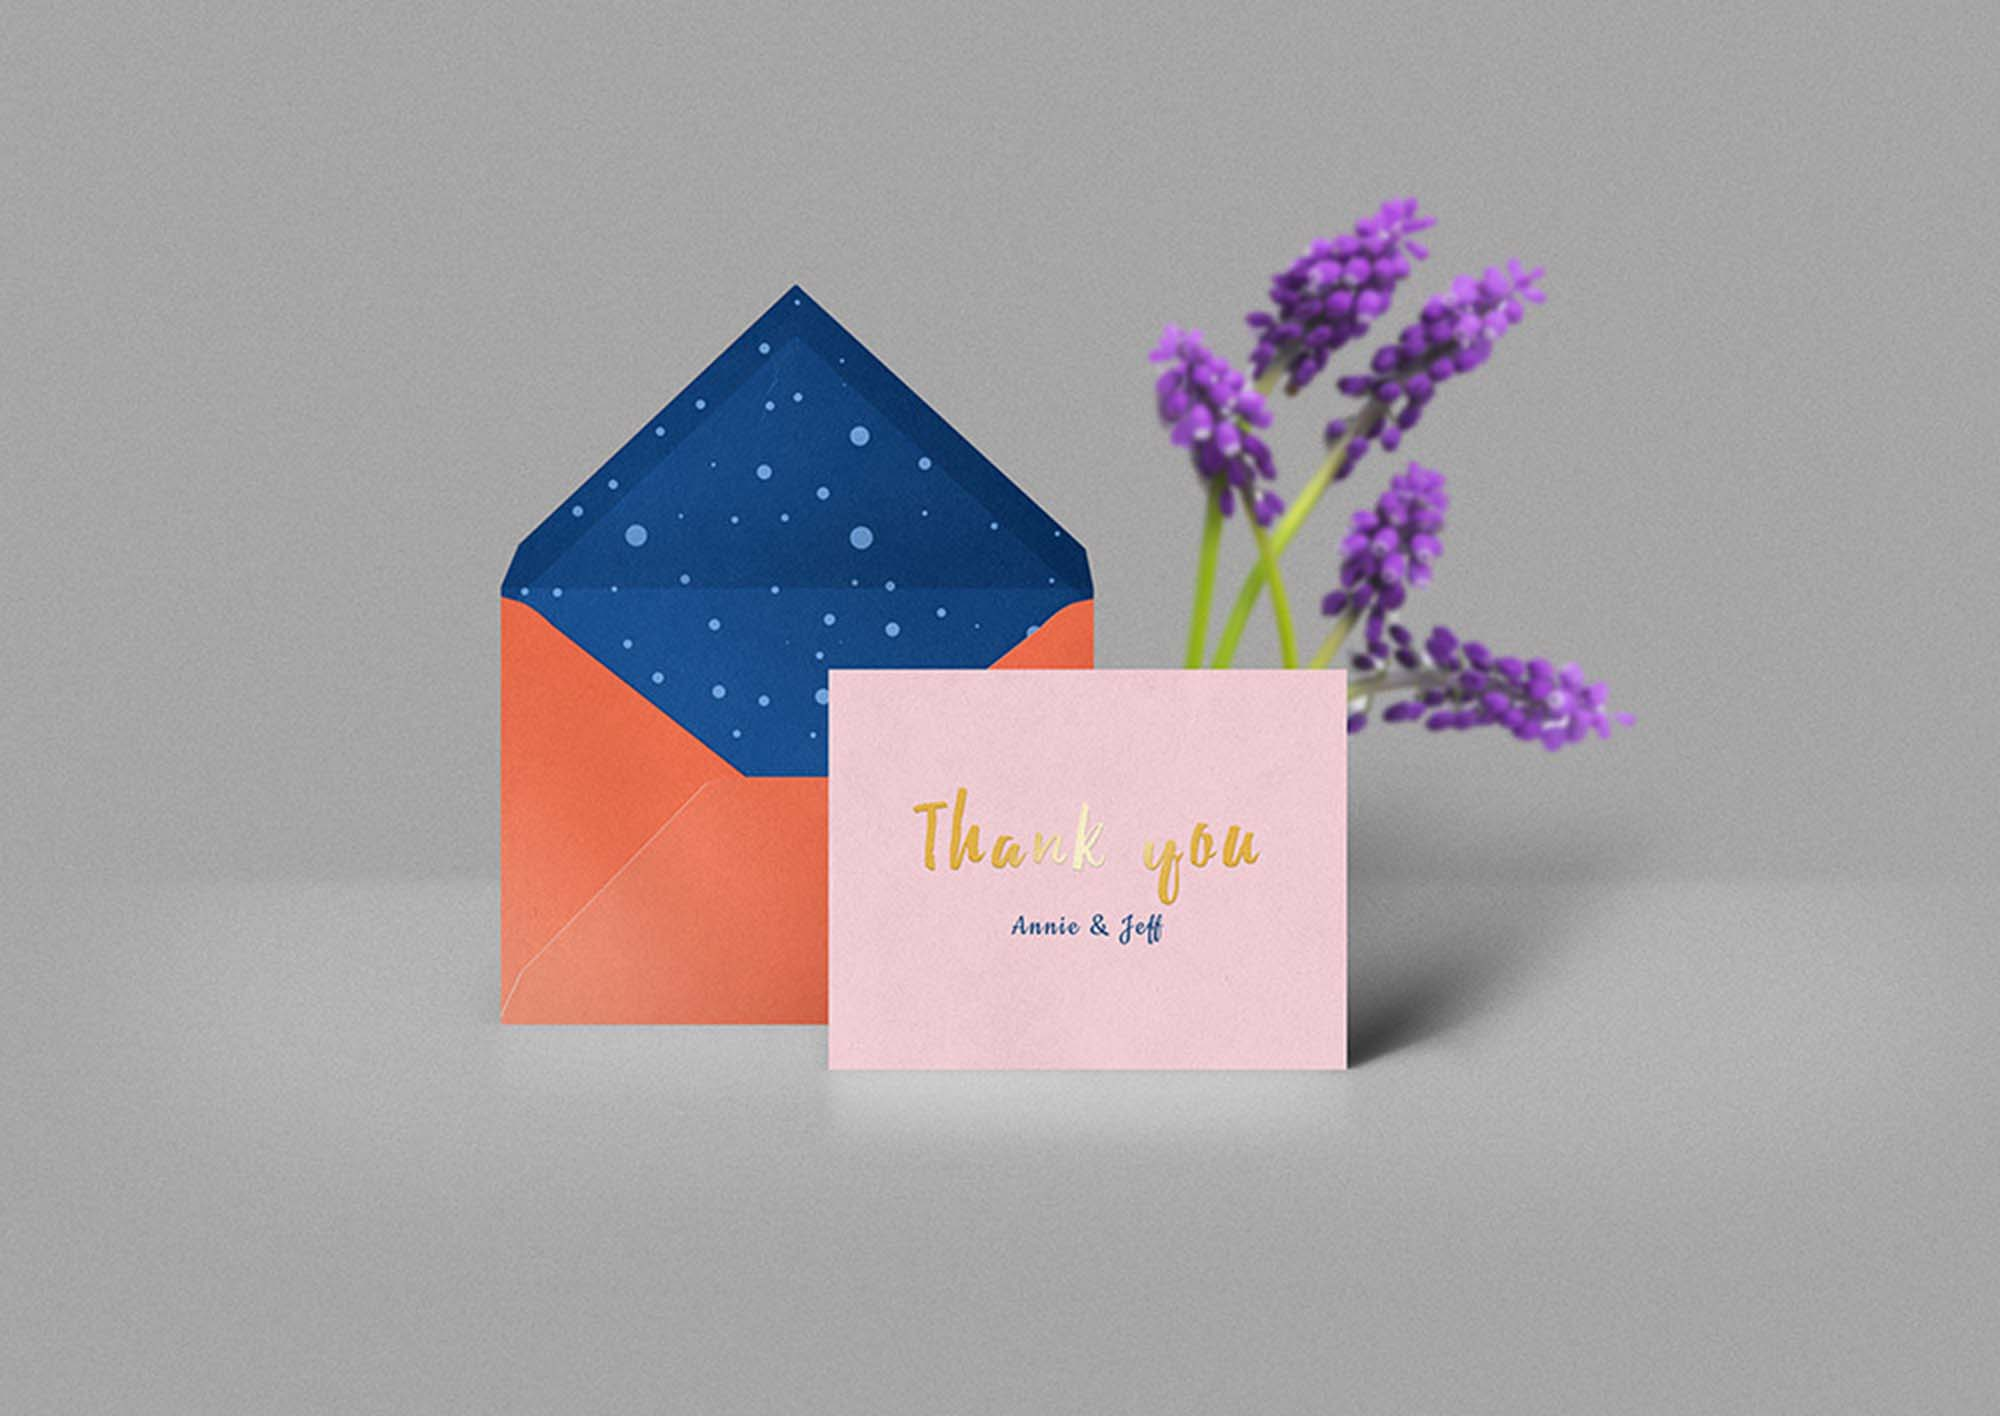 Thank You Card Envelope Mockup